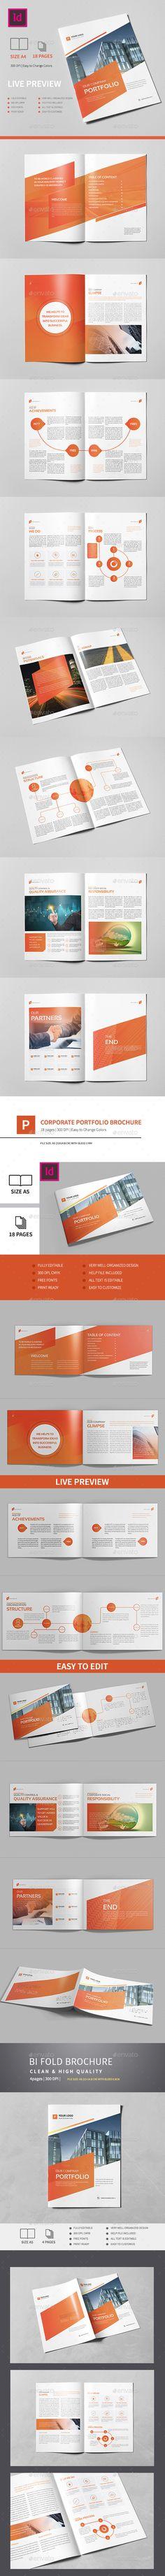 Brochure Bundle 3x1 / Templates InDesign INDD. Download here…